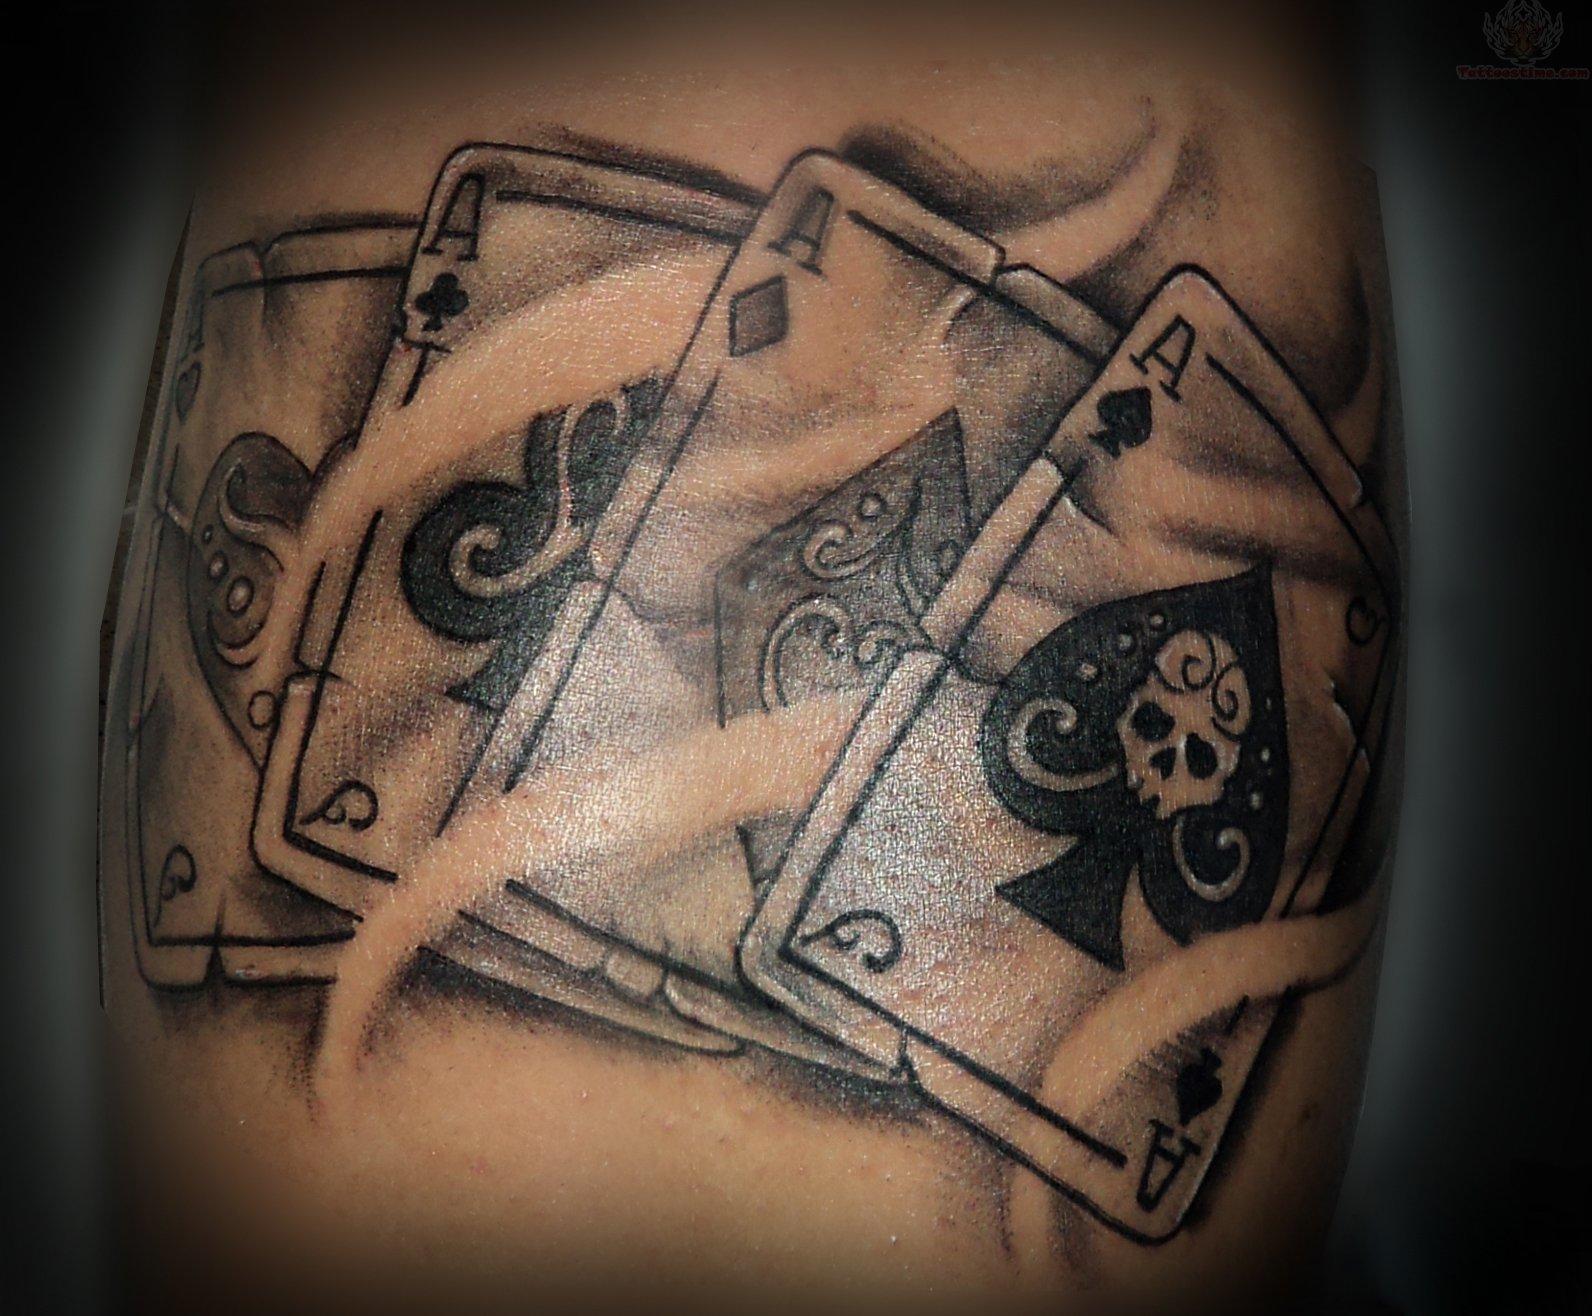 Blue Diamond Tattoo Meaning Cards tattoo designs 10